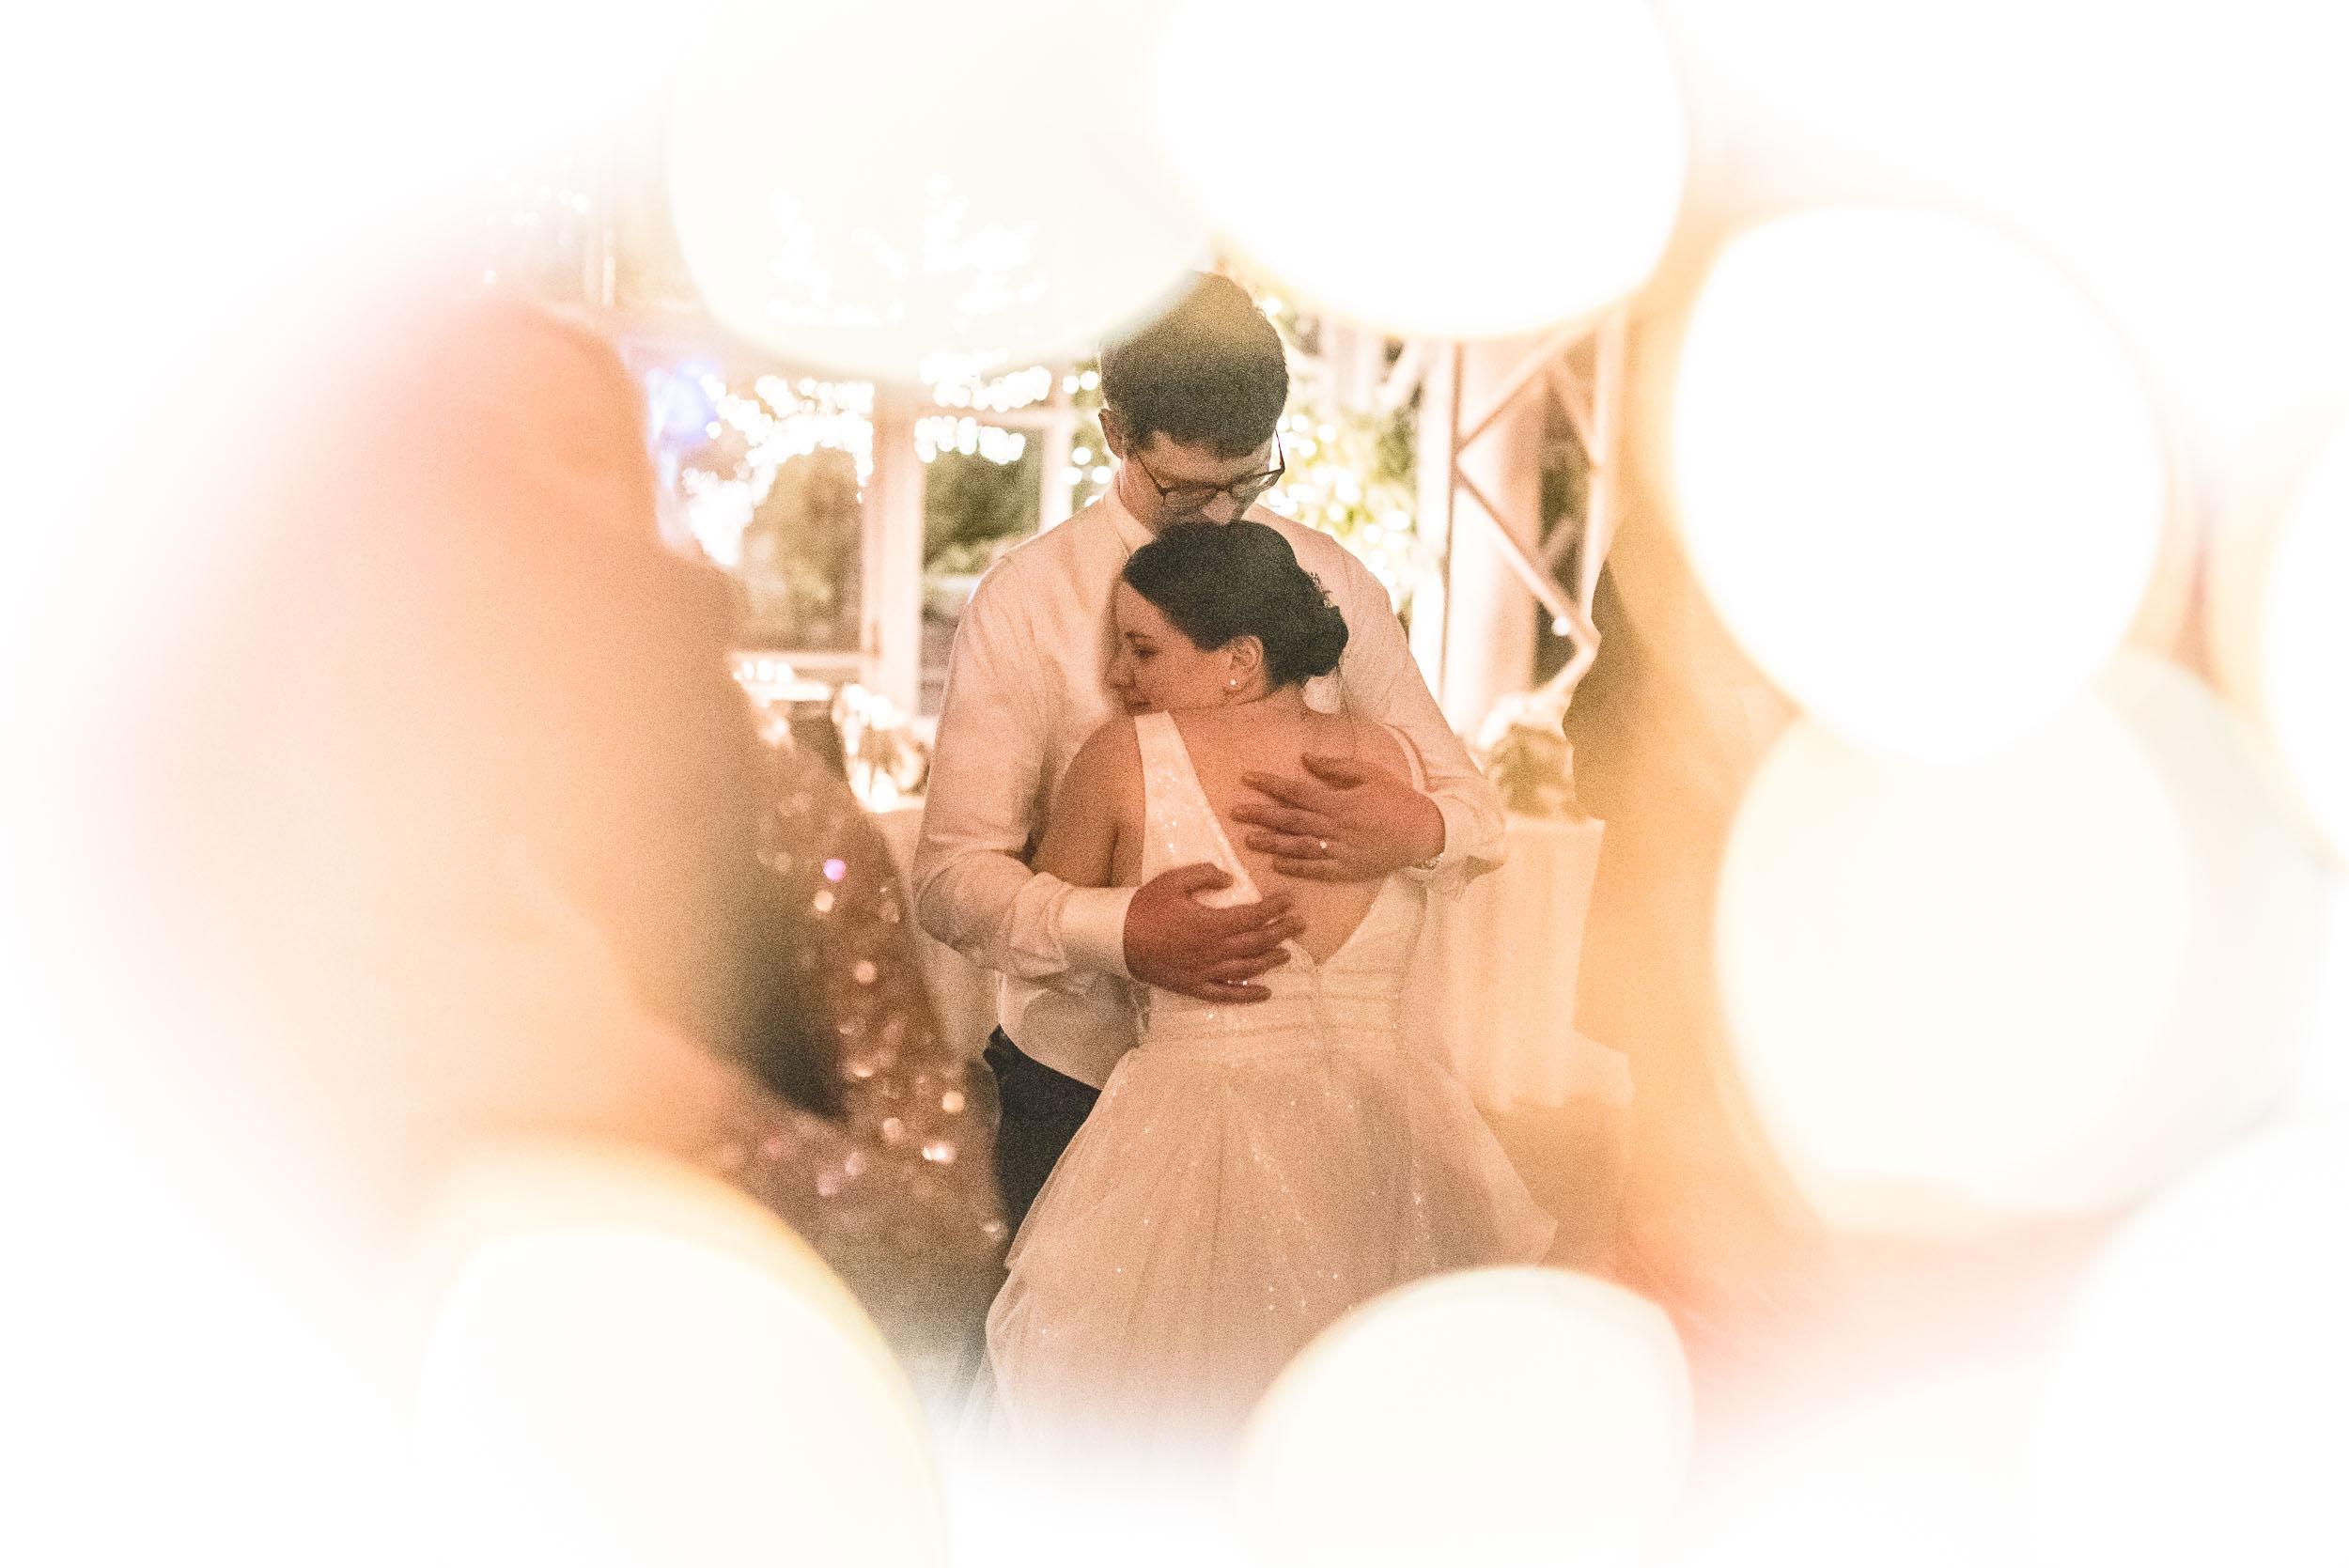 KatieandMathias_Morristown_NewJersey_Wedding_Church_Assumption_Madison_Hotel(61of65).jpg